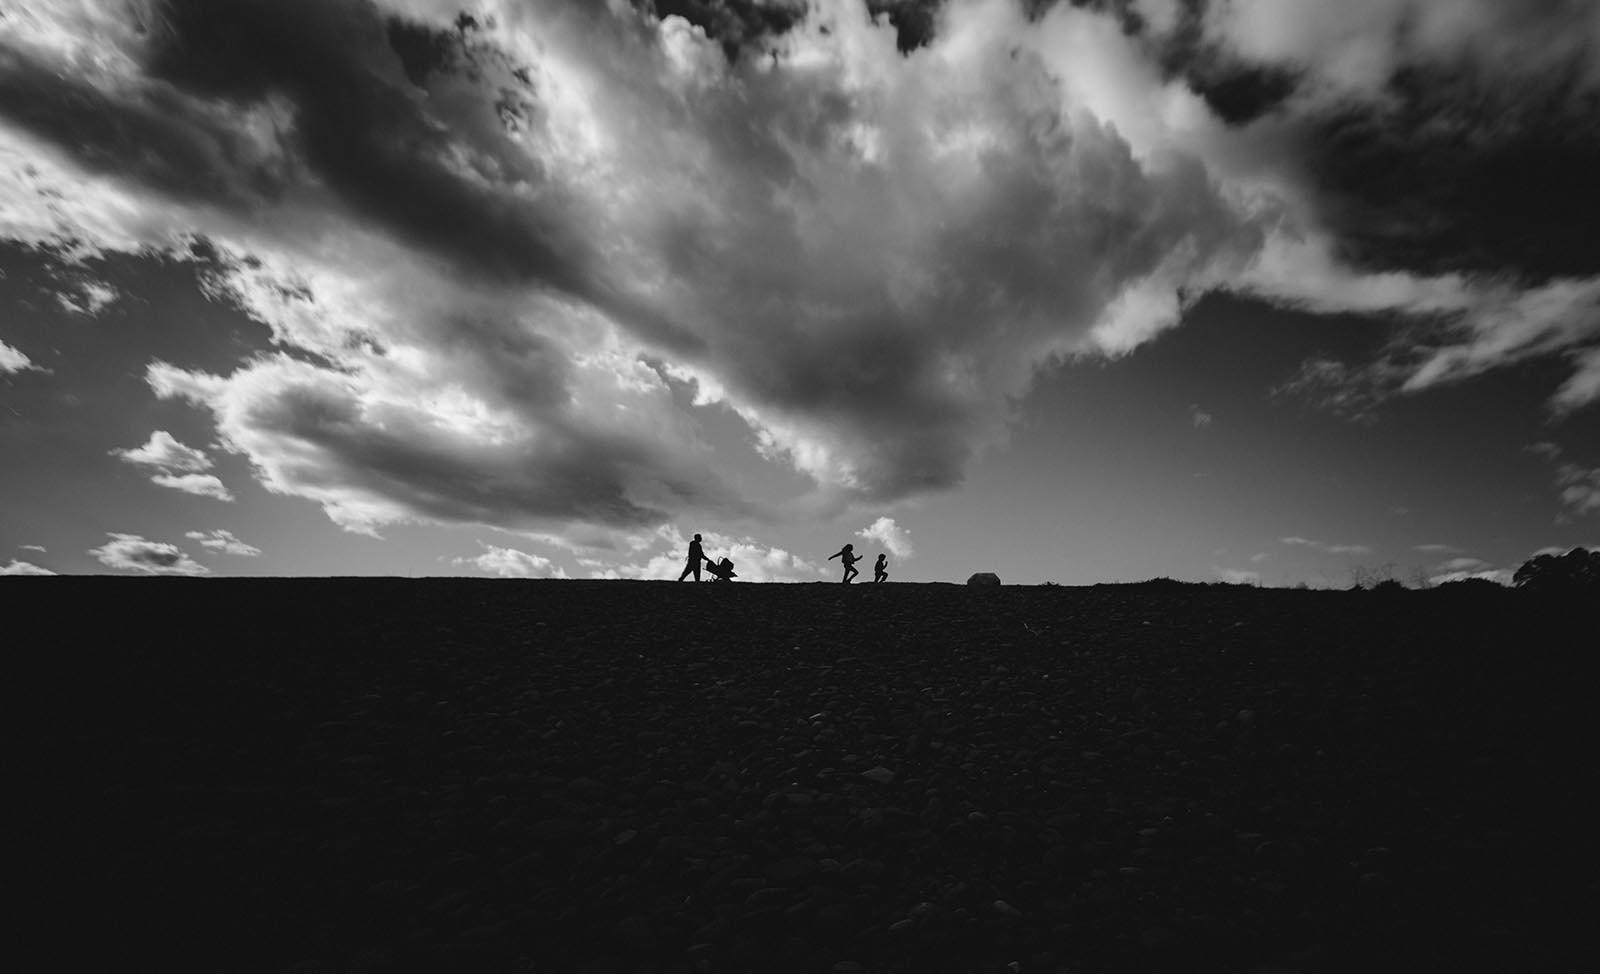 Black and white photo in harsh light